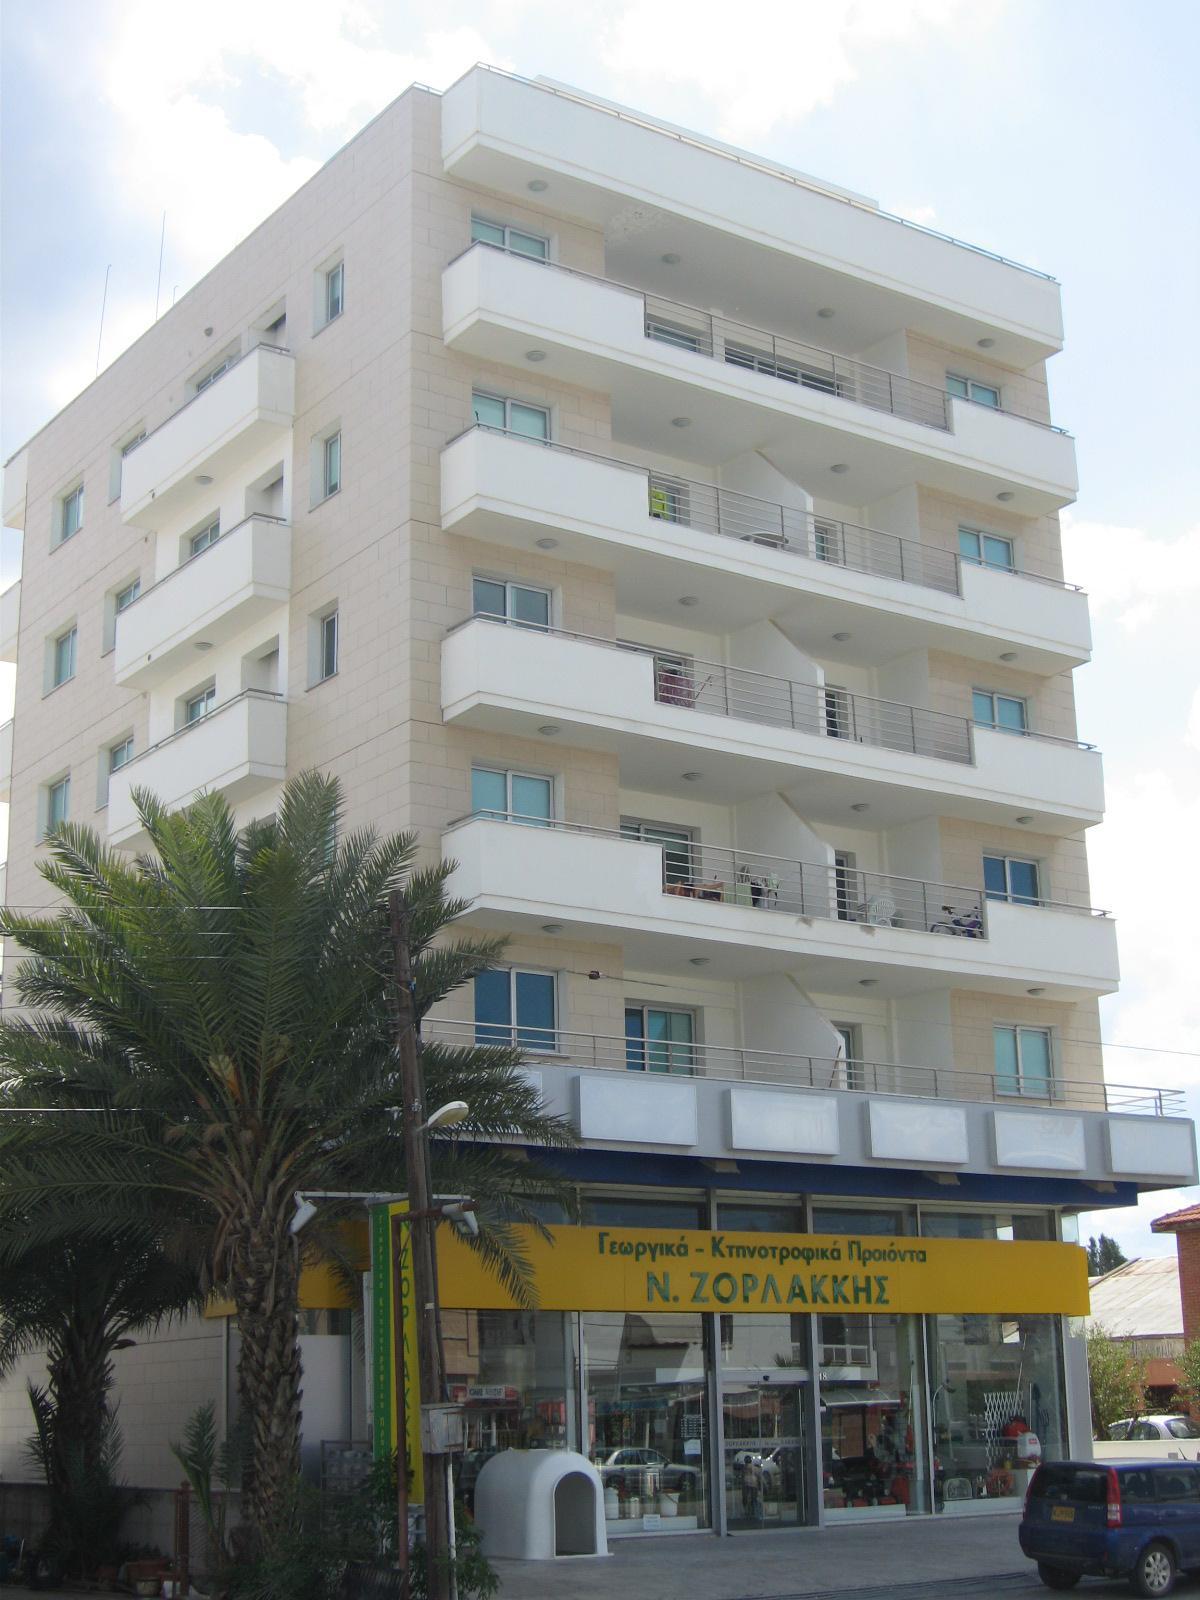 EKATERINI I – 48 Kyriacou Matsi Avenue, 2409 Engomi, Nicosia, CYPRUS